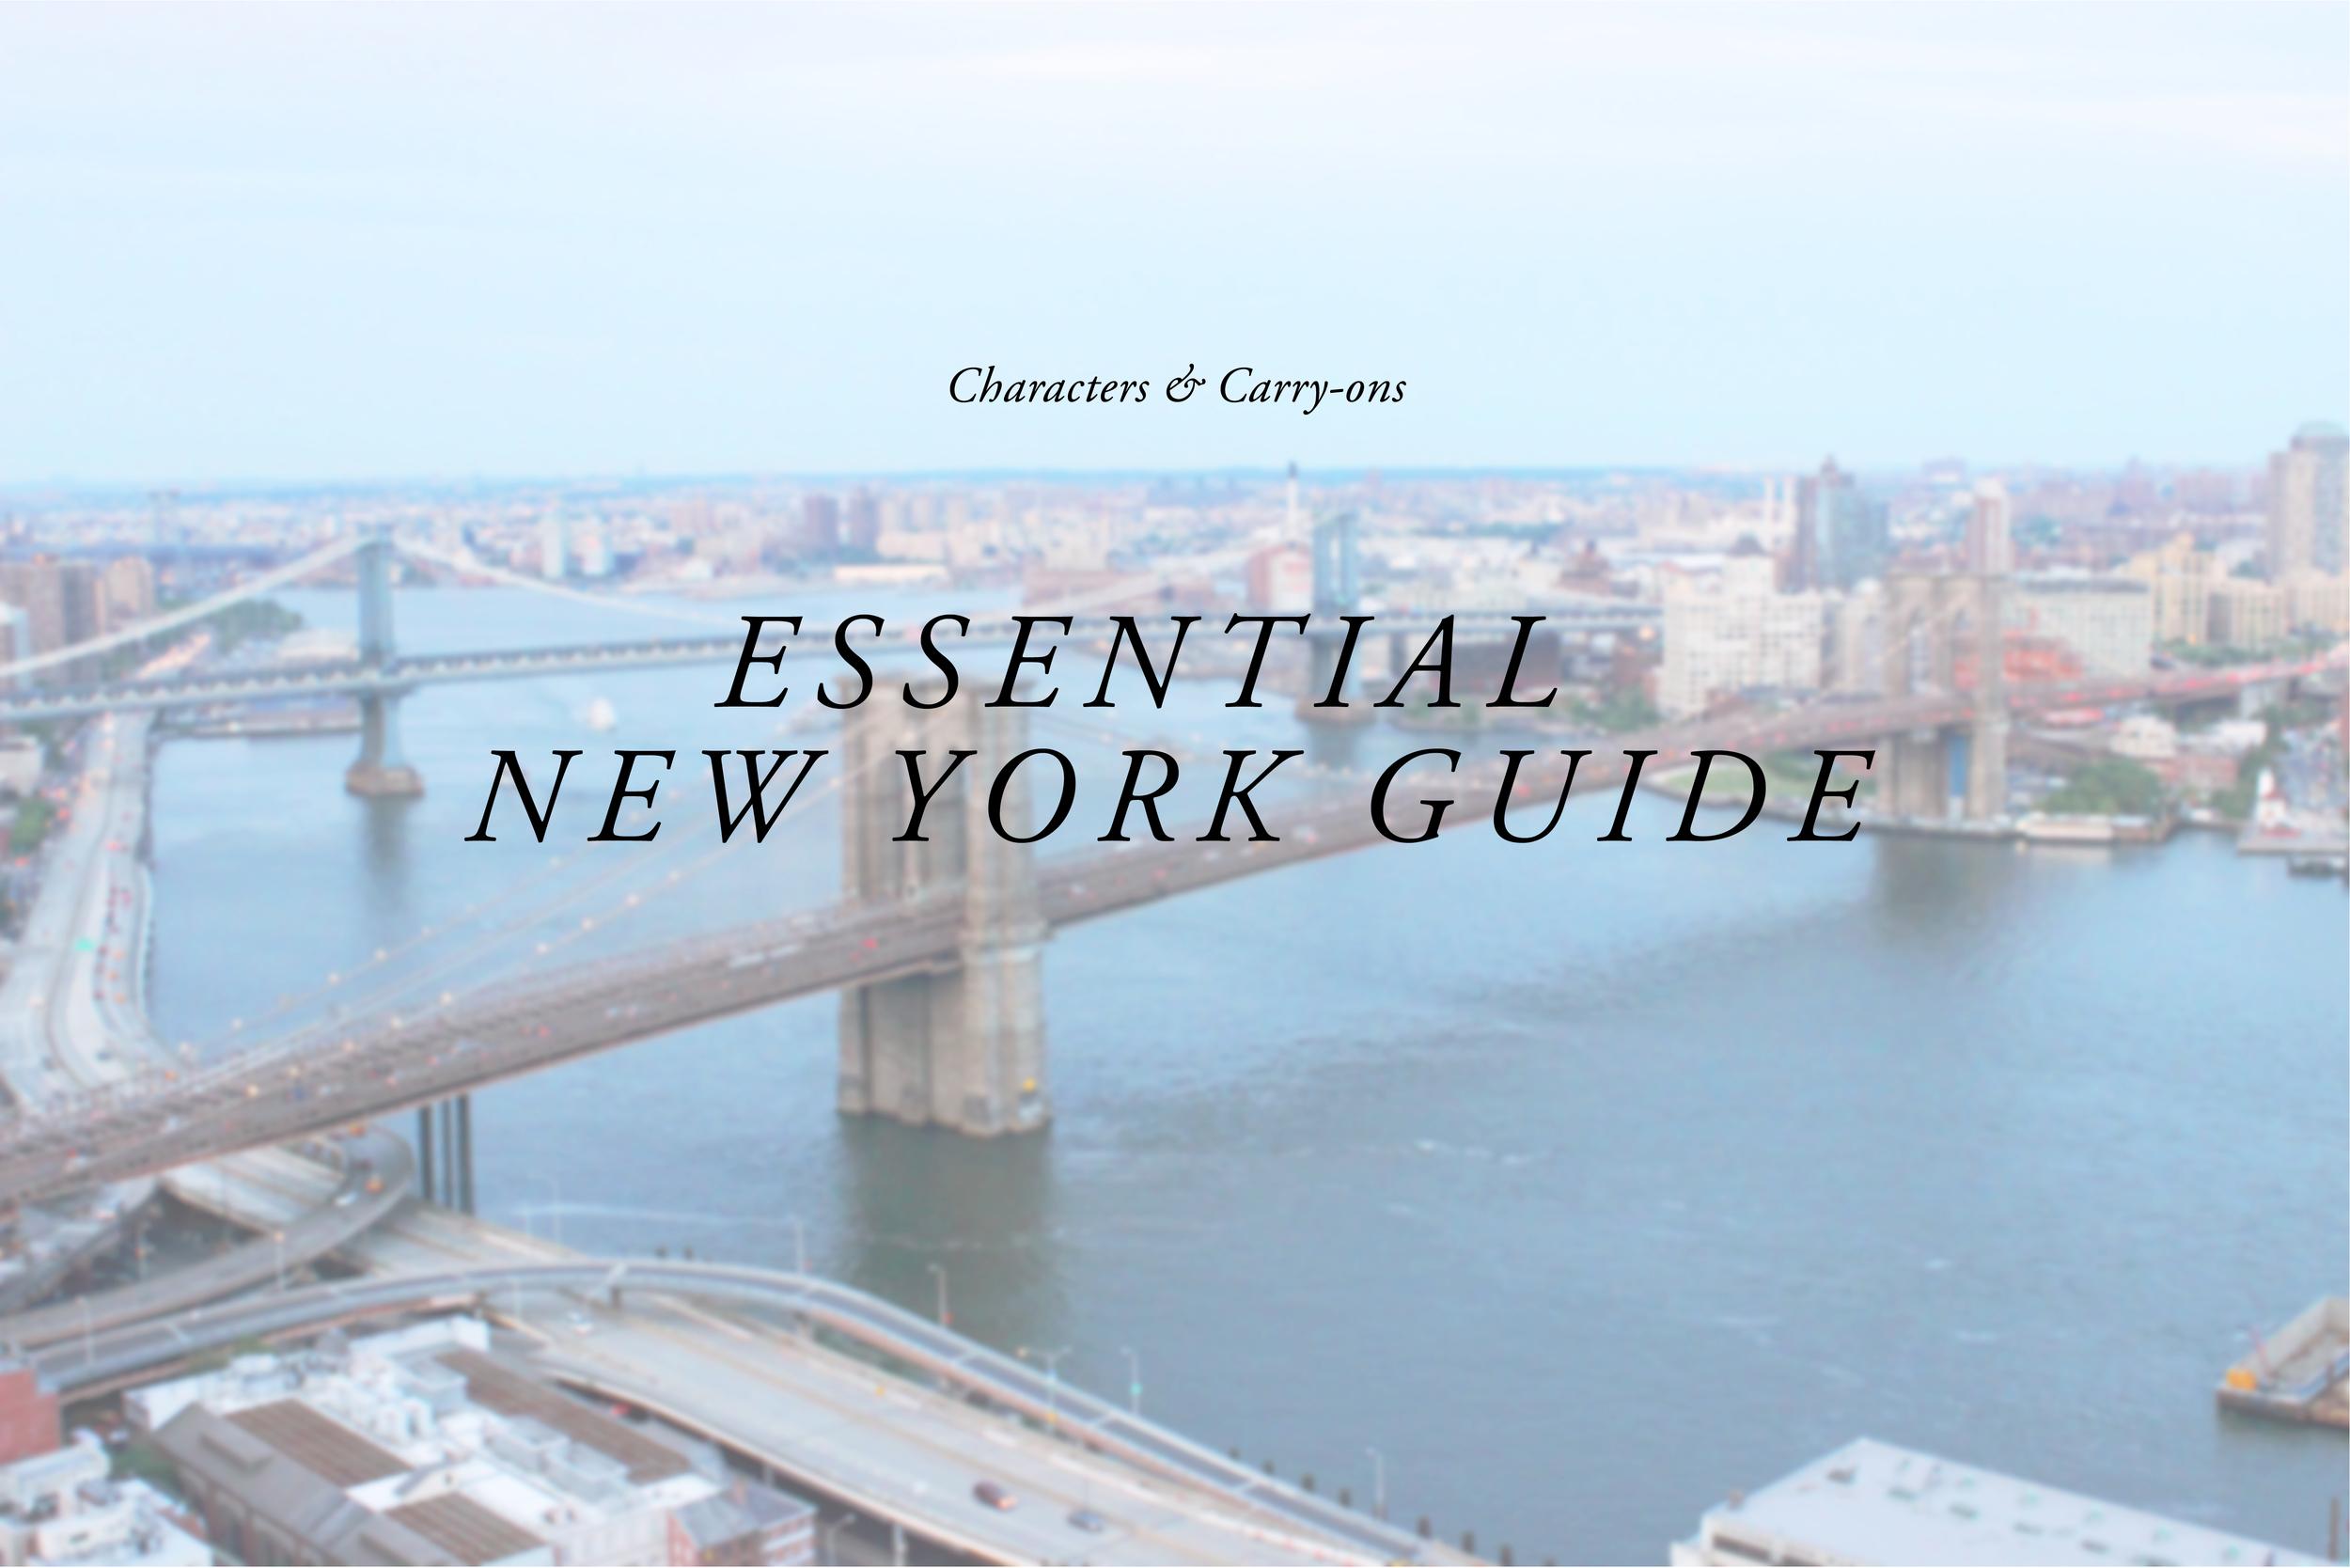 ESSENTIAL NEW YORK GUIDE.jpg